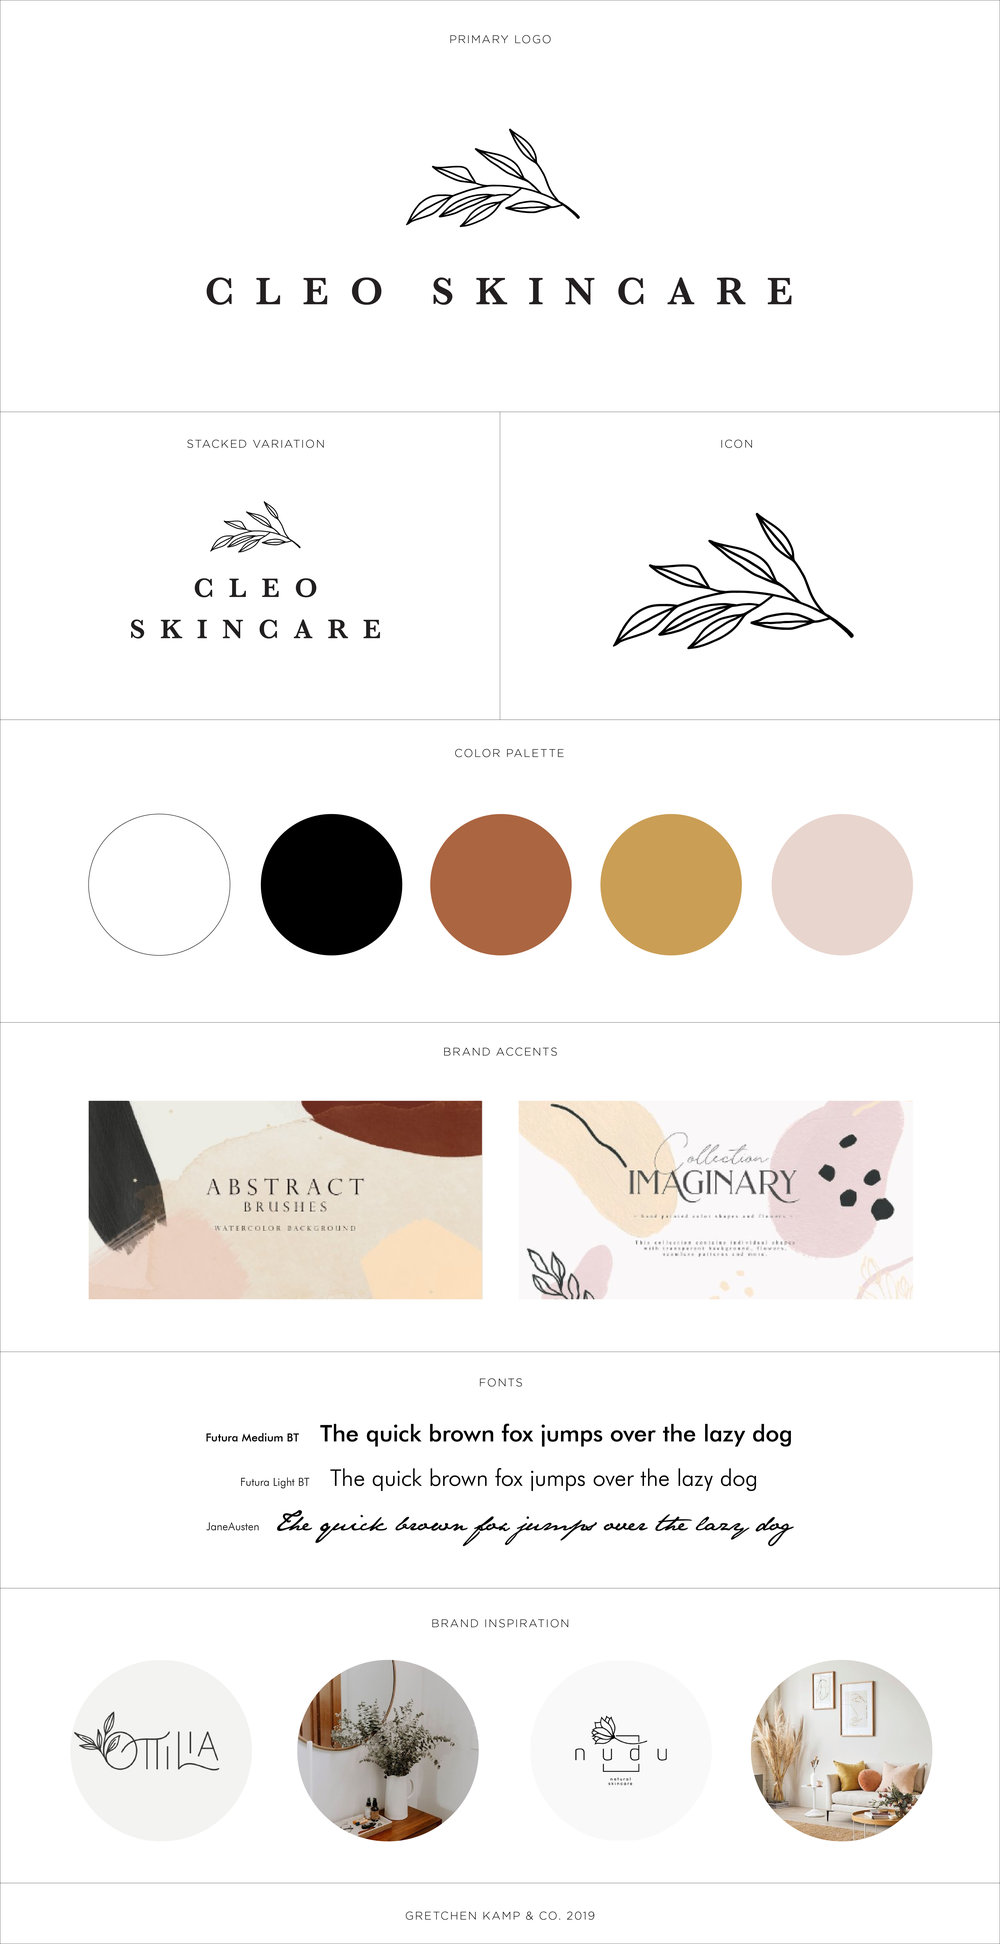 CleoSkincare_BrandBoard_v02.jpg